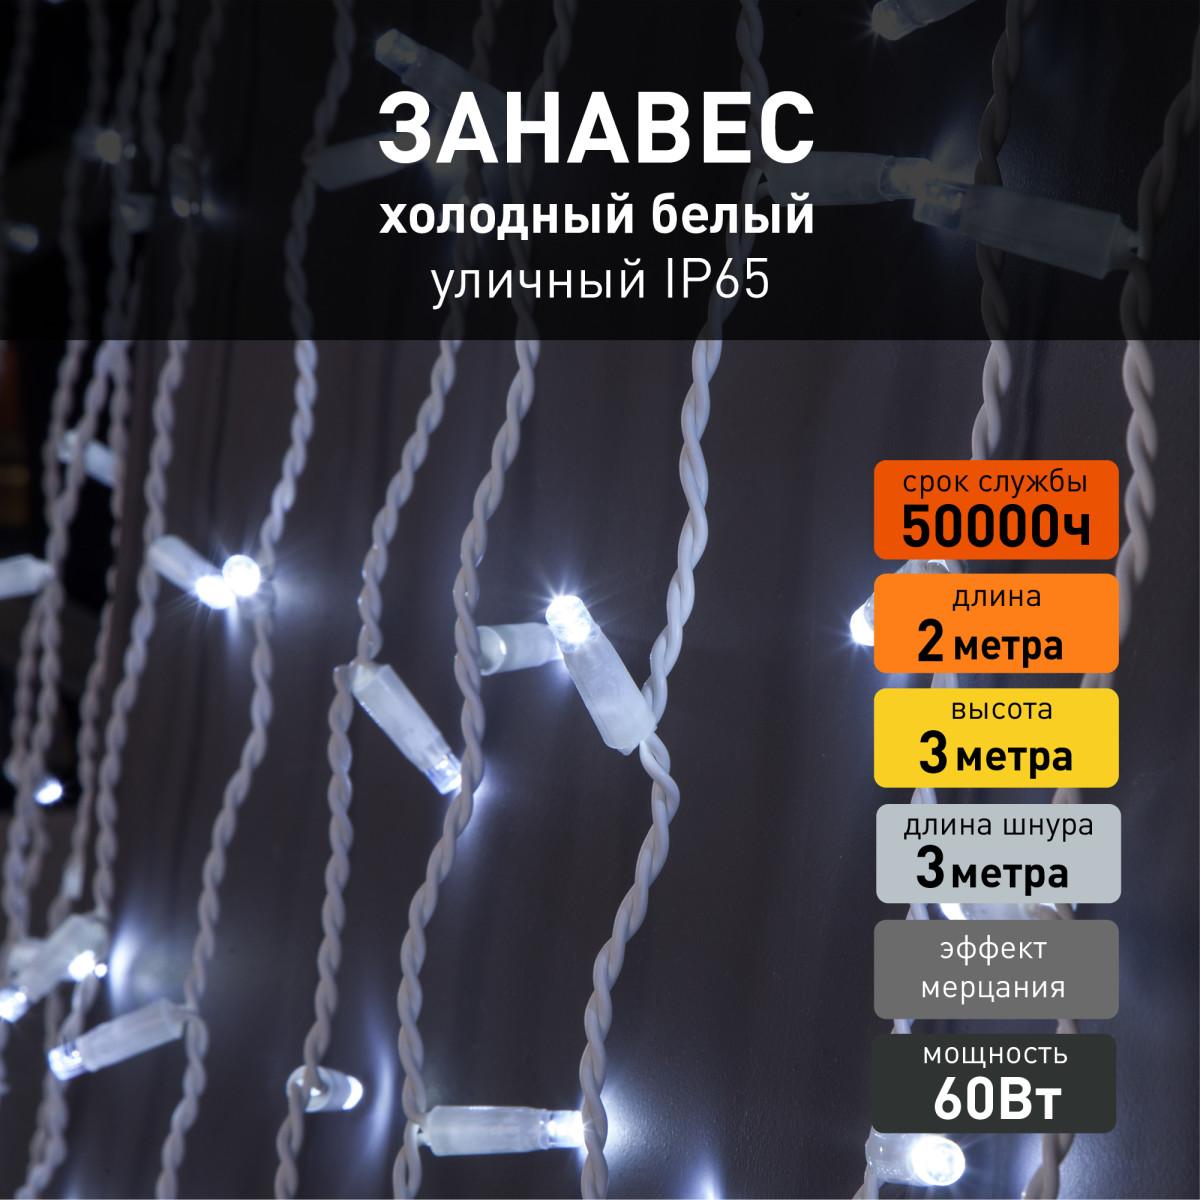 Гирлянда Eurosvet 200-101 белый с эффектом мерцания 600 лампочек